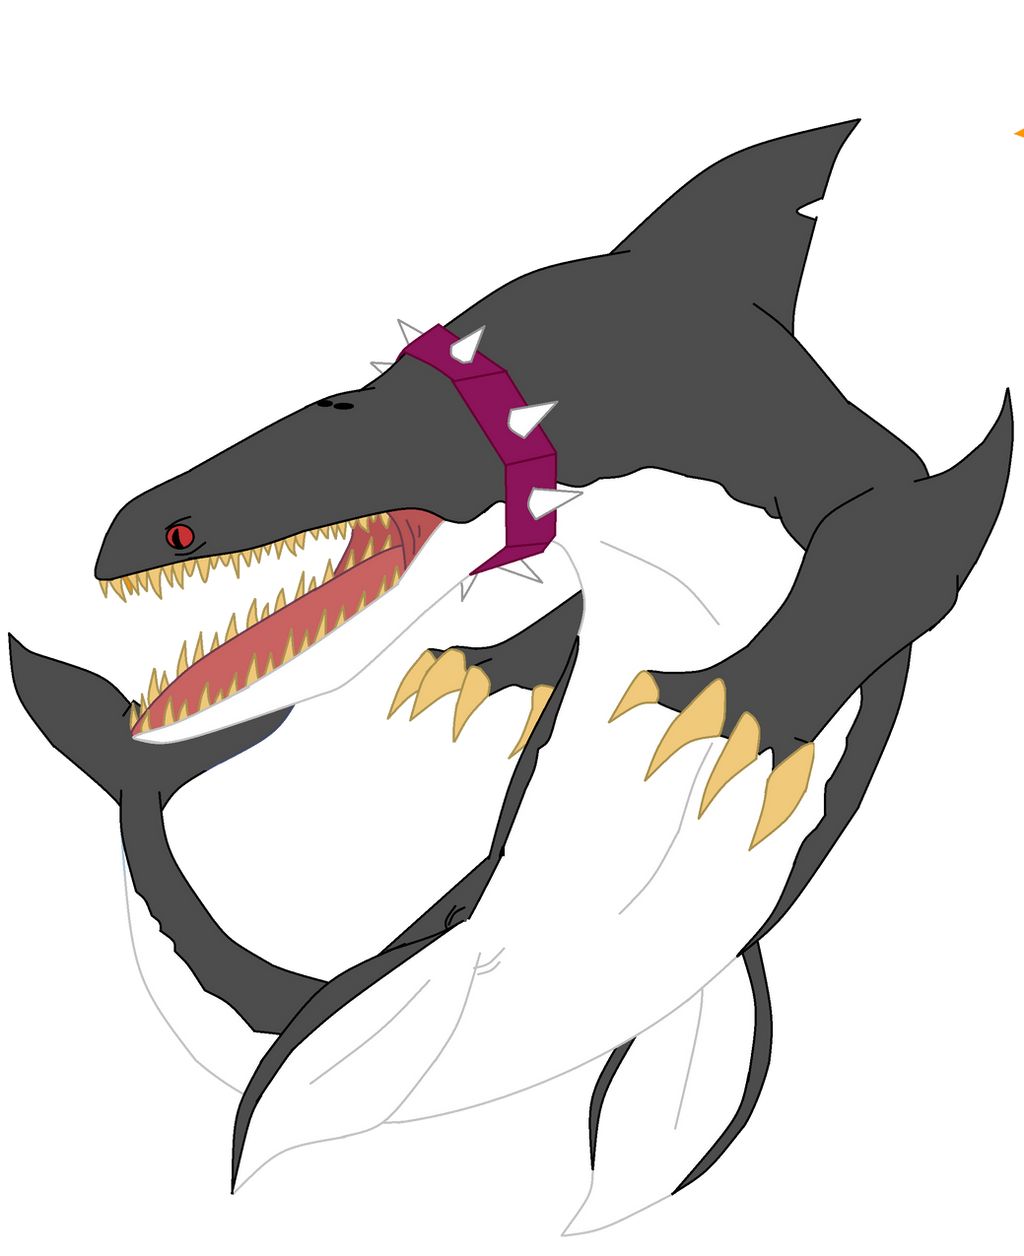 Ripjaws Predator Leviathan By TheWalrusclown